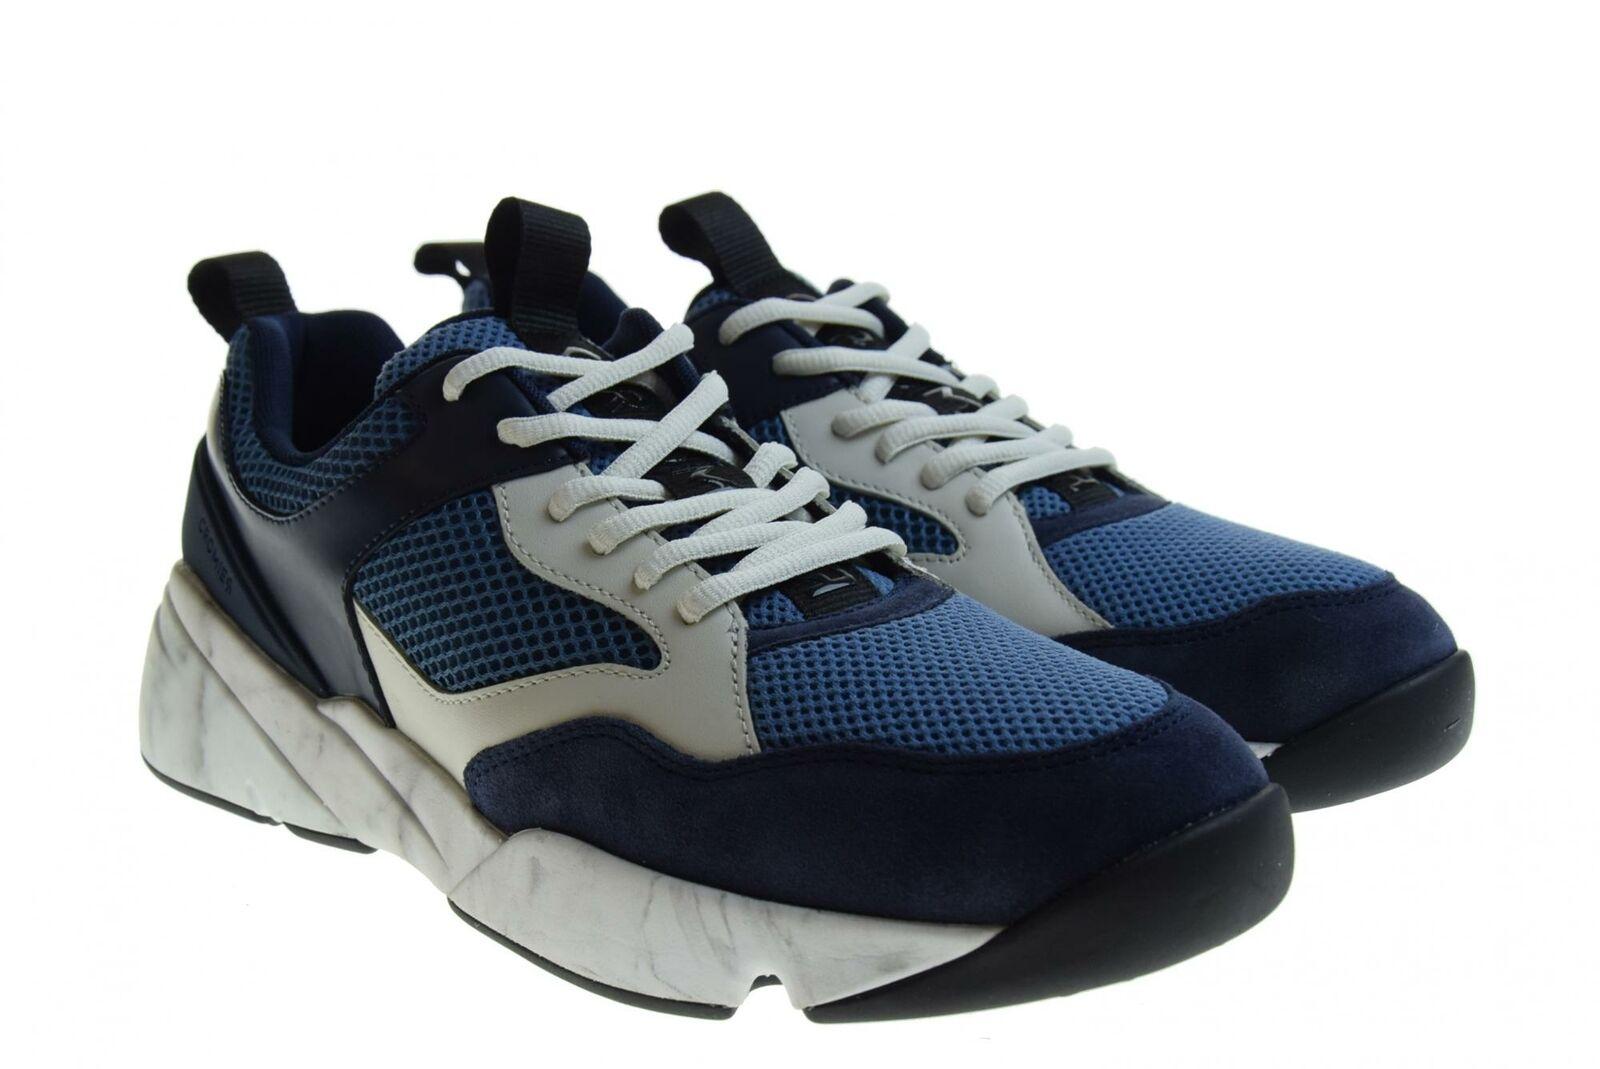 Cromier P19us shoes men sneakers 2C02 blueE